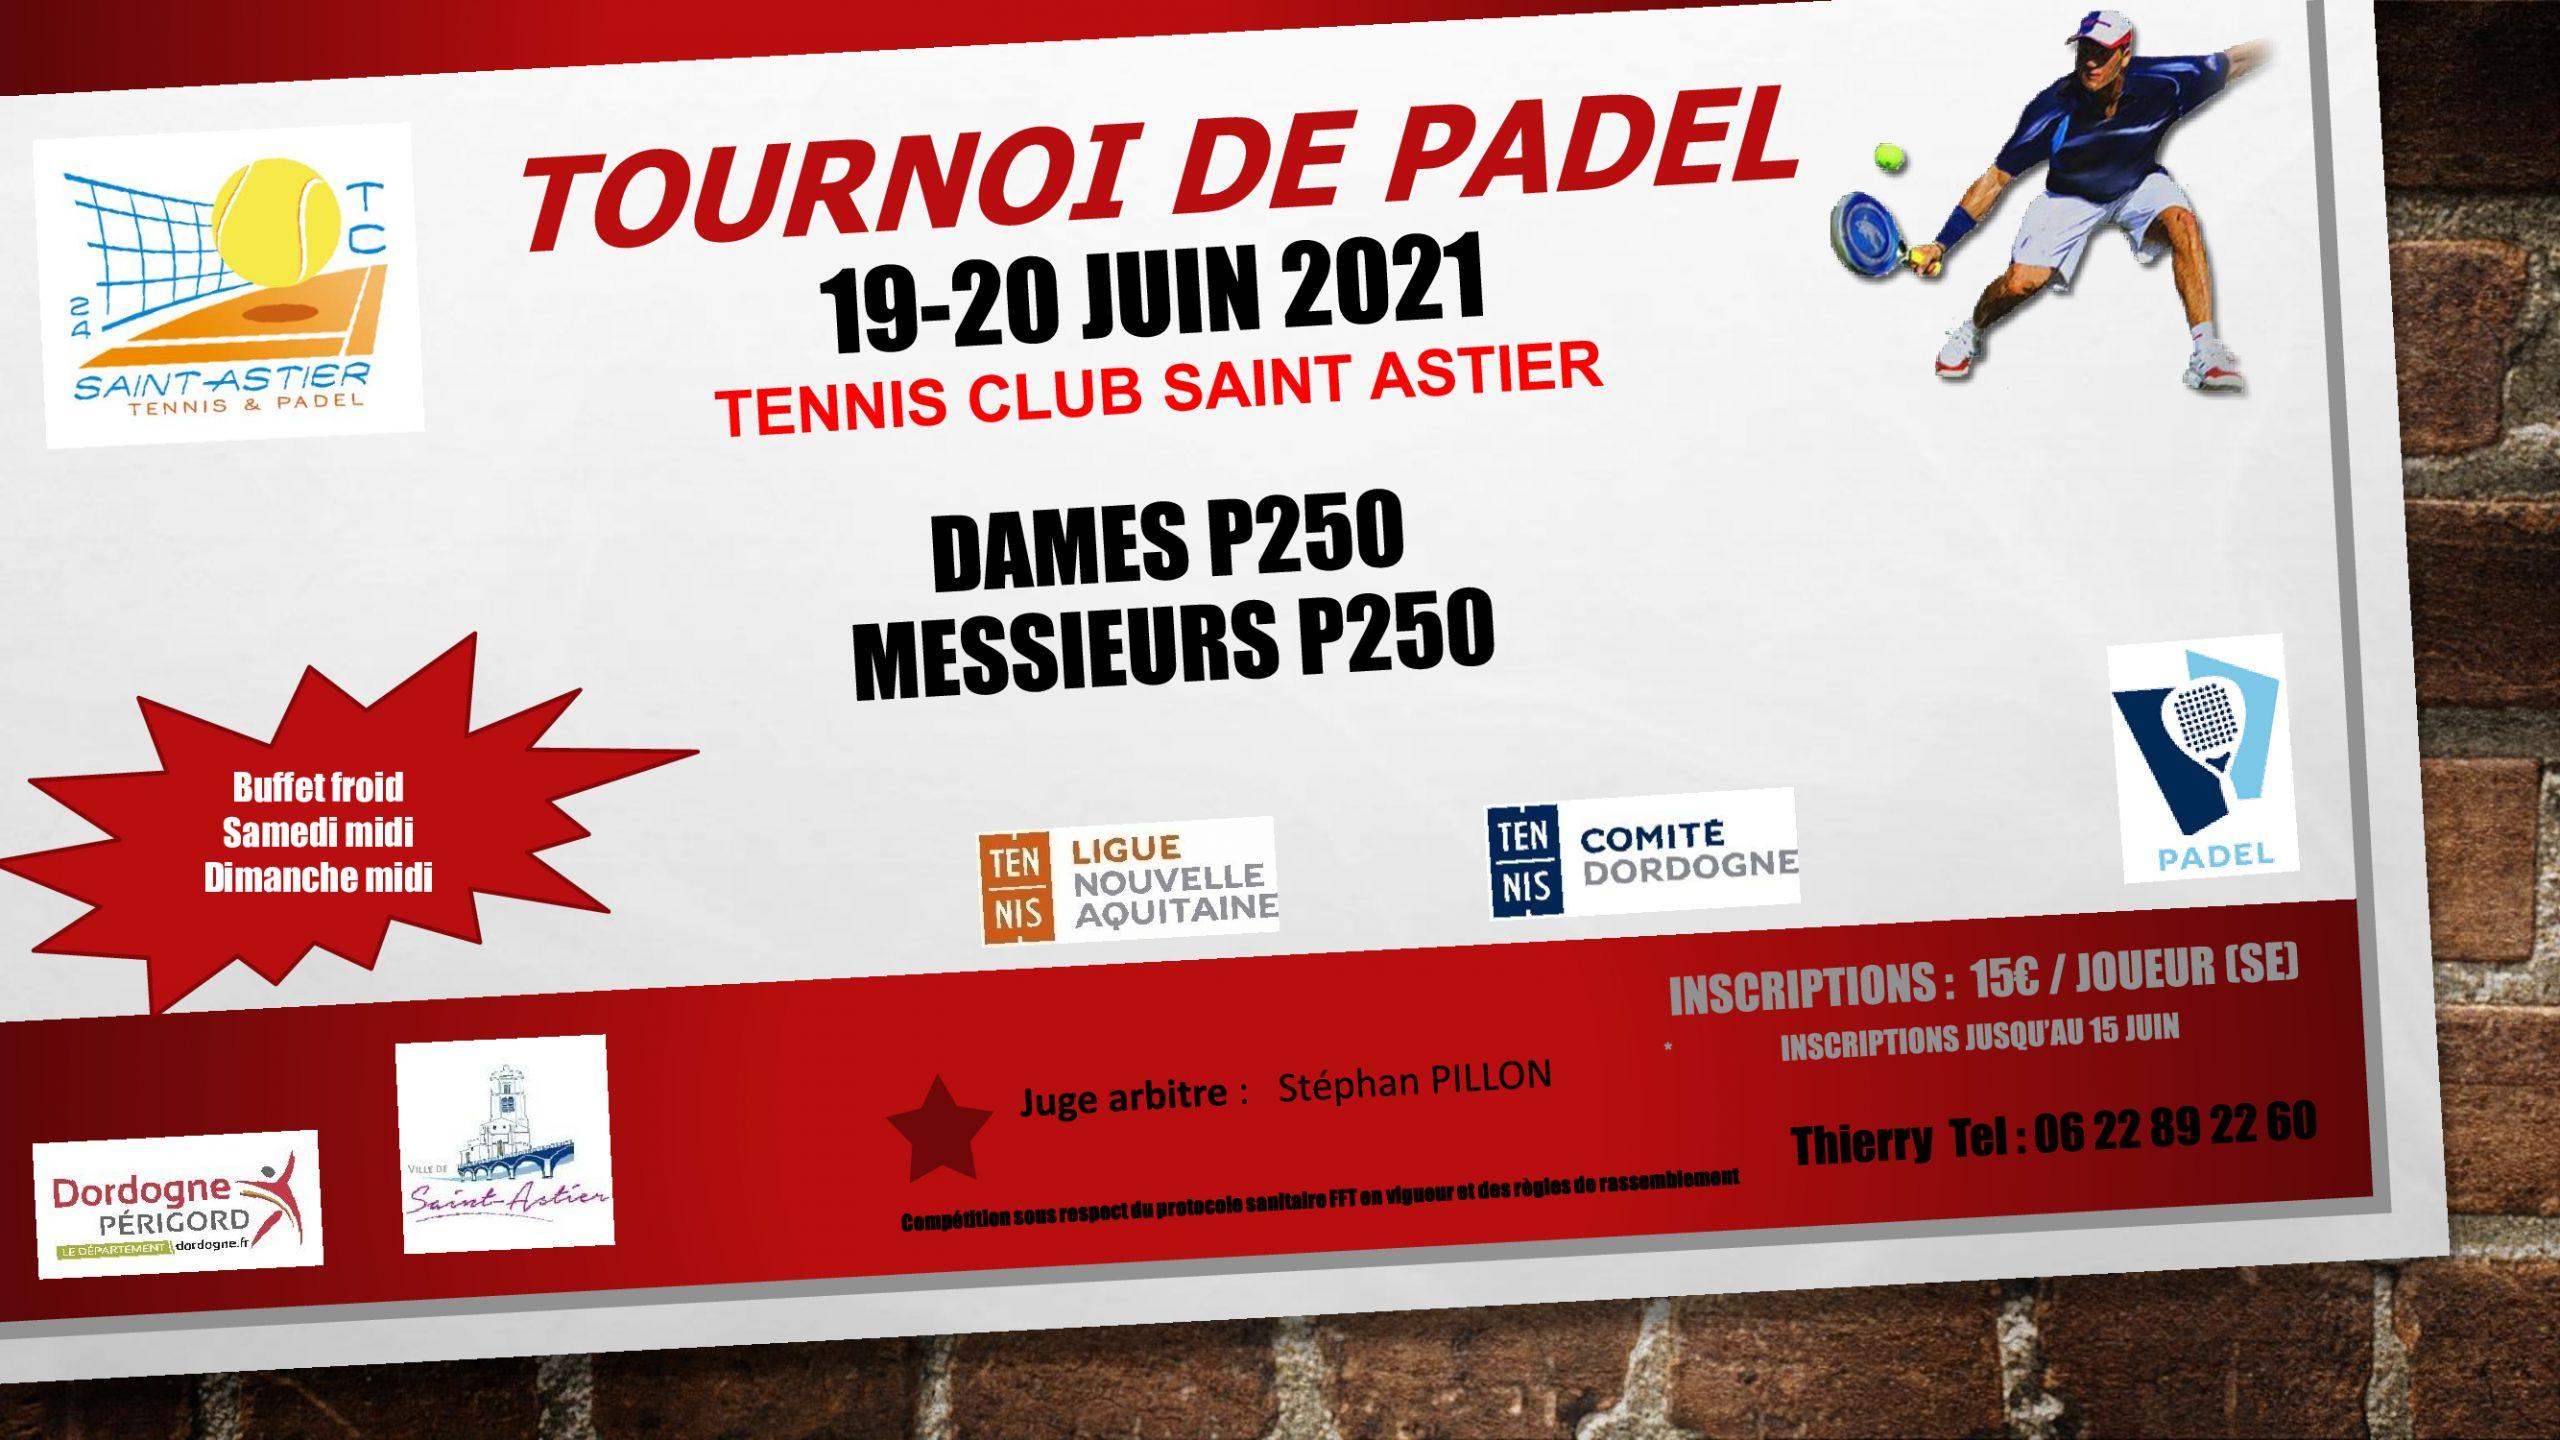 astier tournoi padel juin 2021